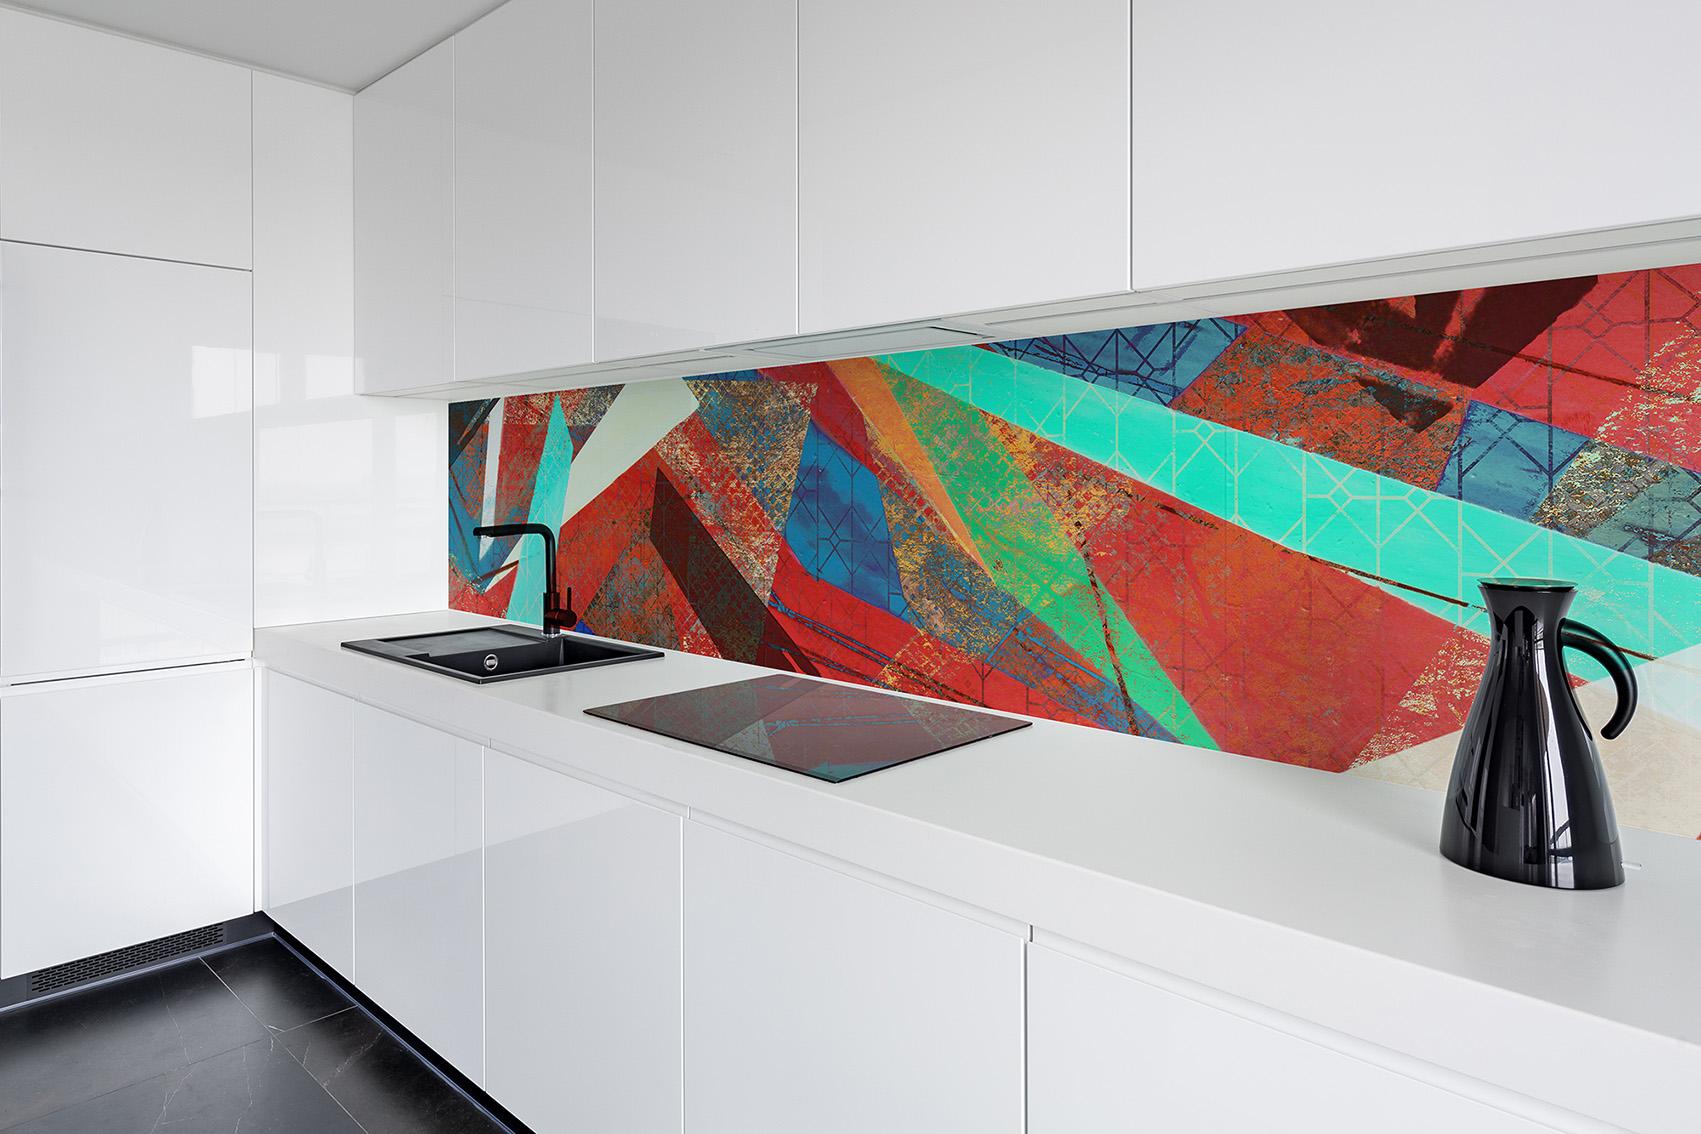 ARCH 2019-9 Retro Mural 2 glass splashback